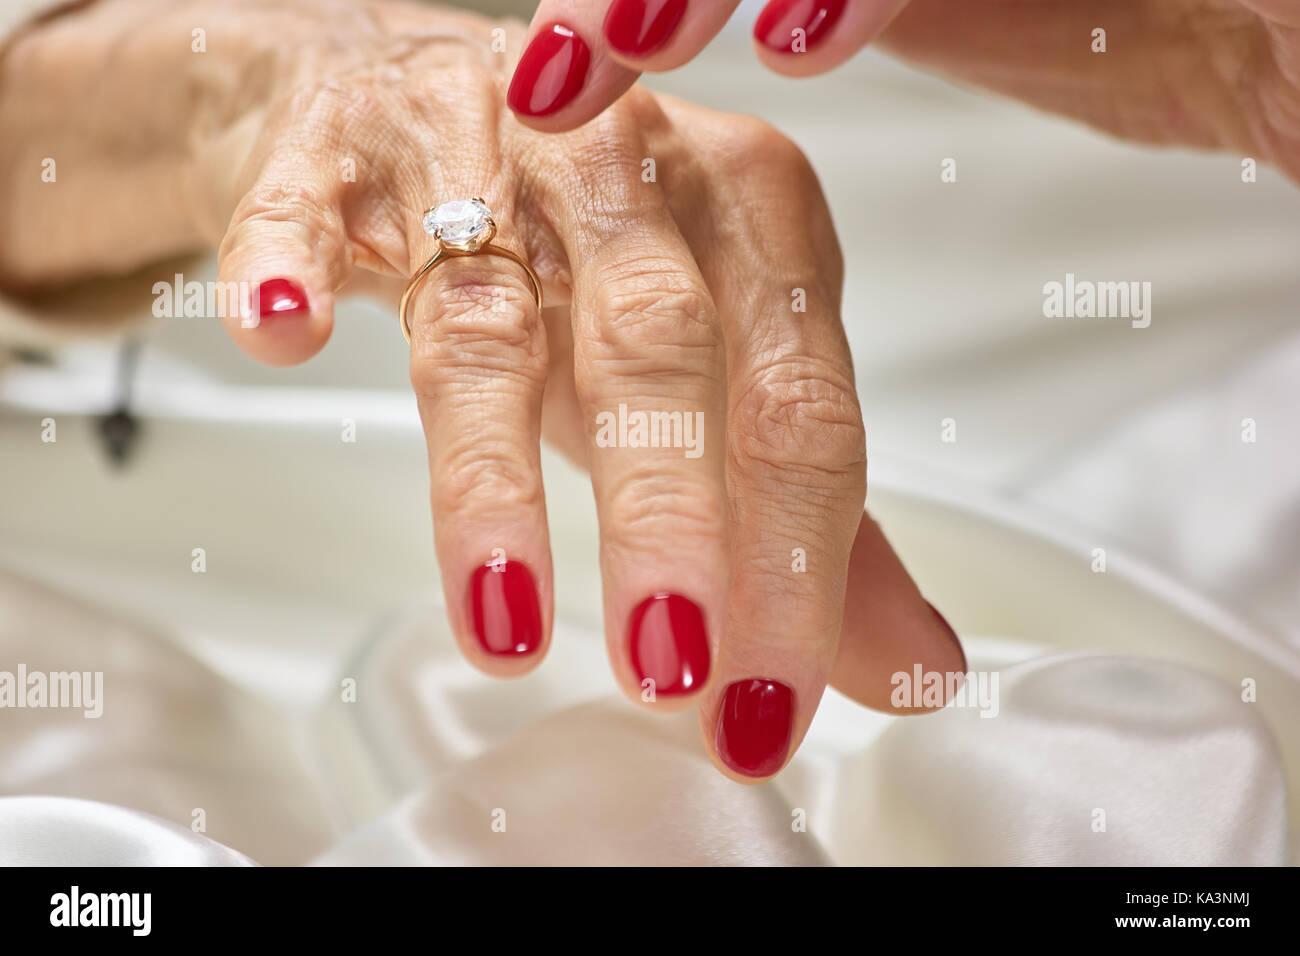 Aristocratism Stockfotos & Aristocratism Bilder - Alamy